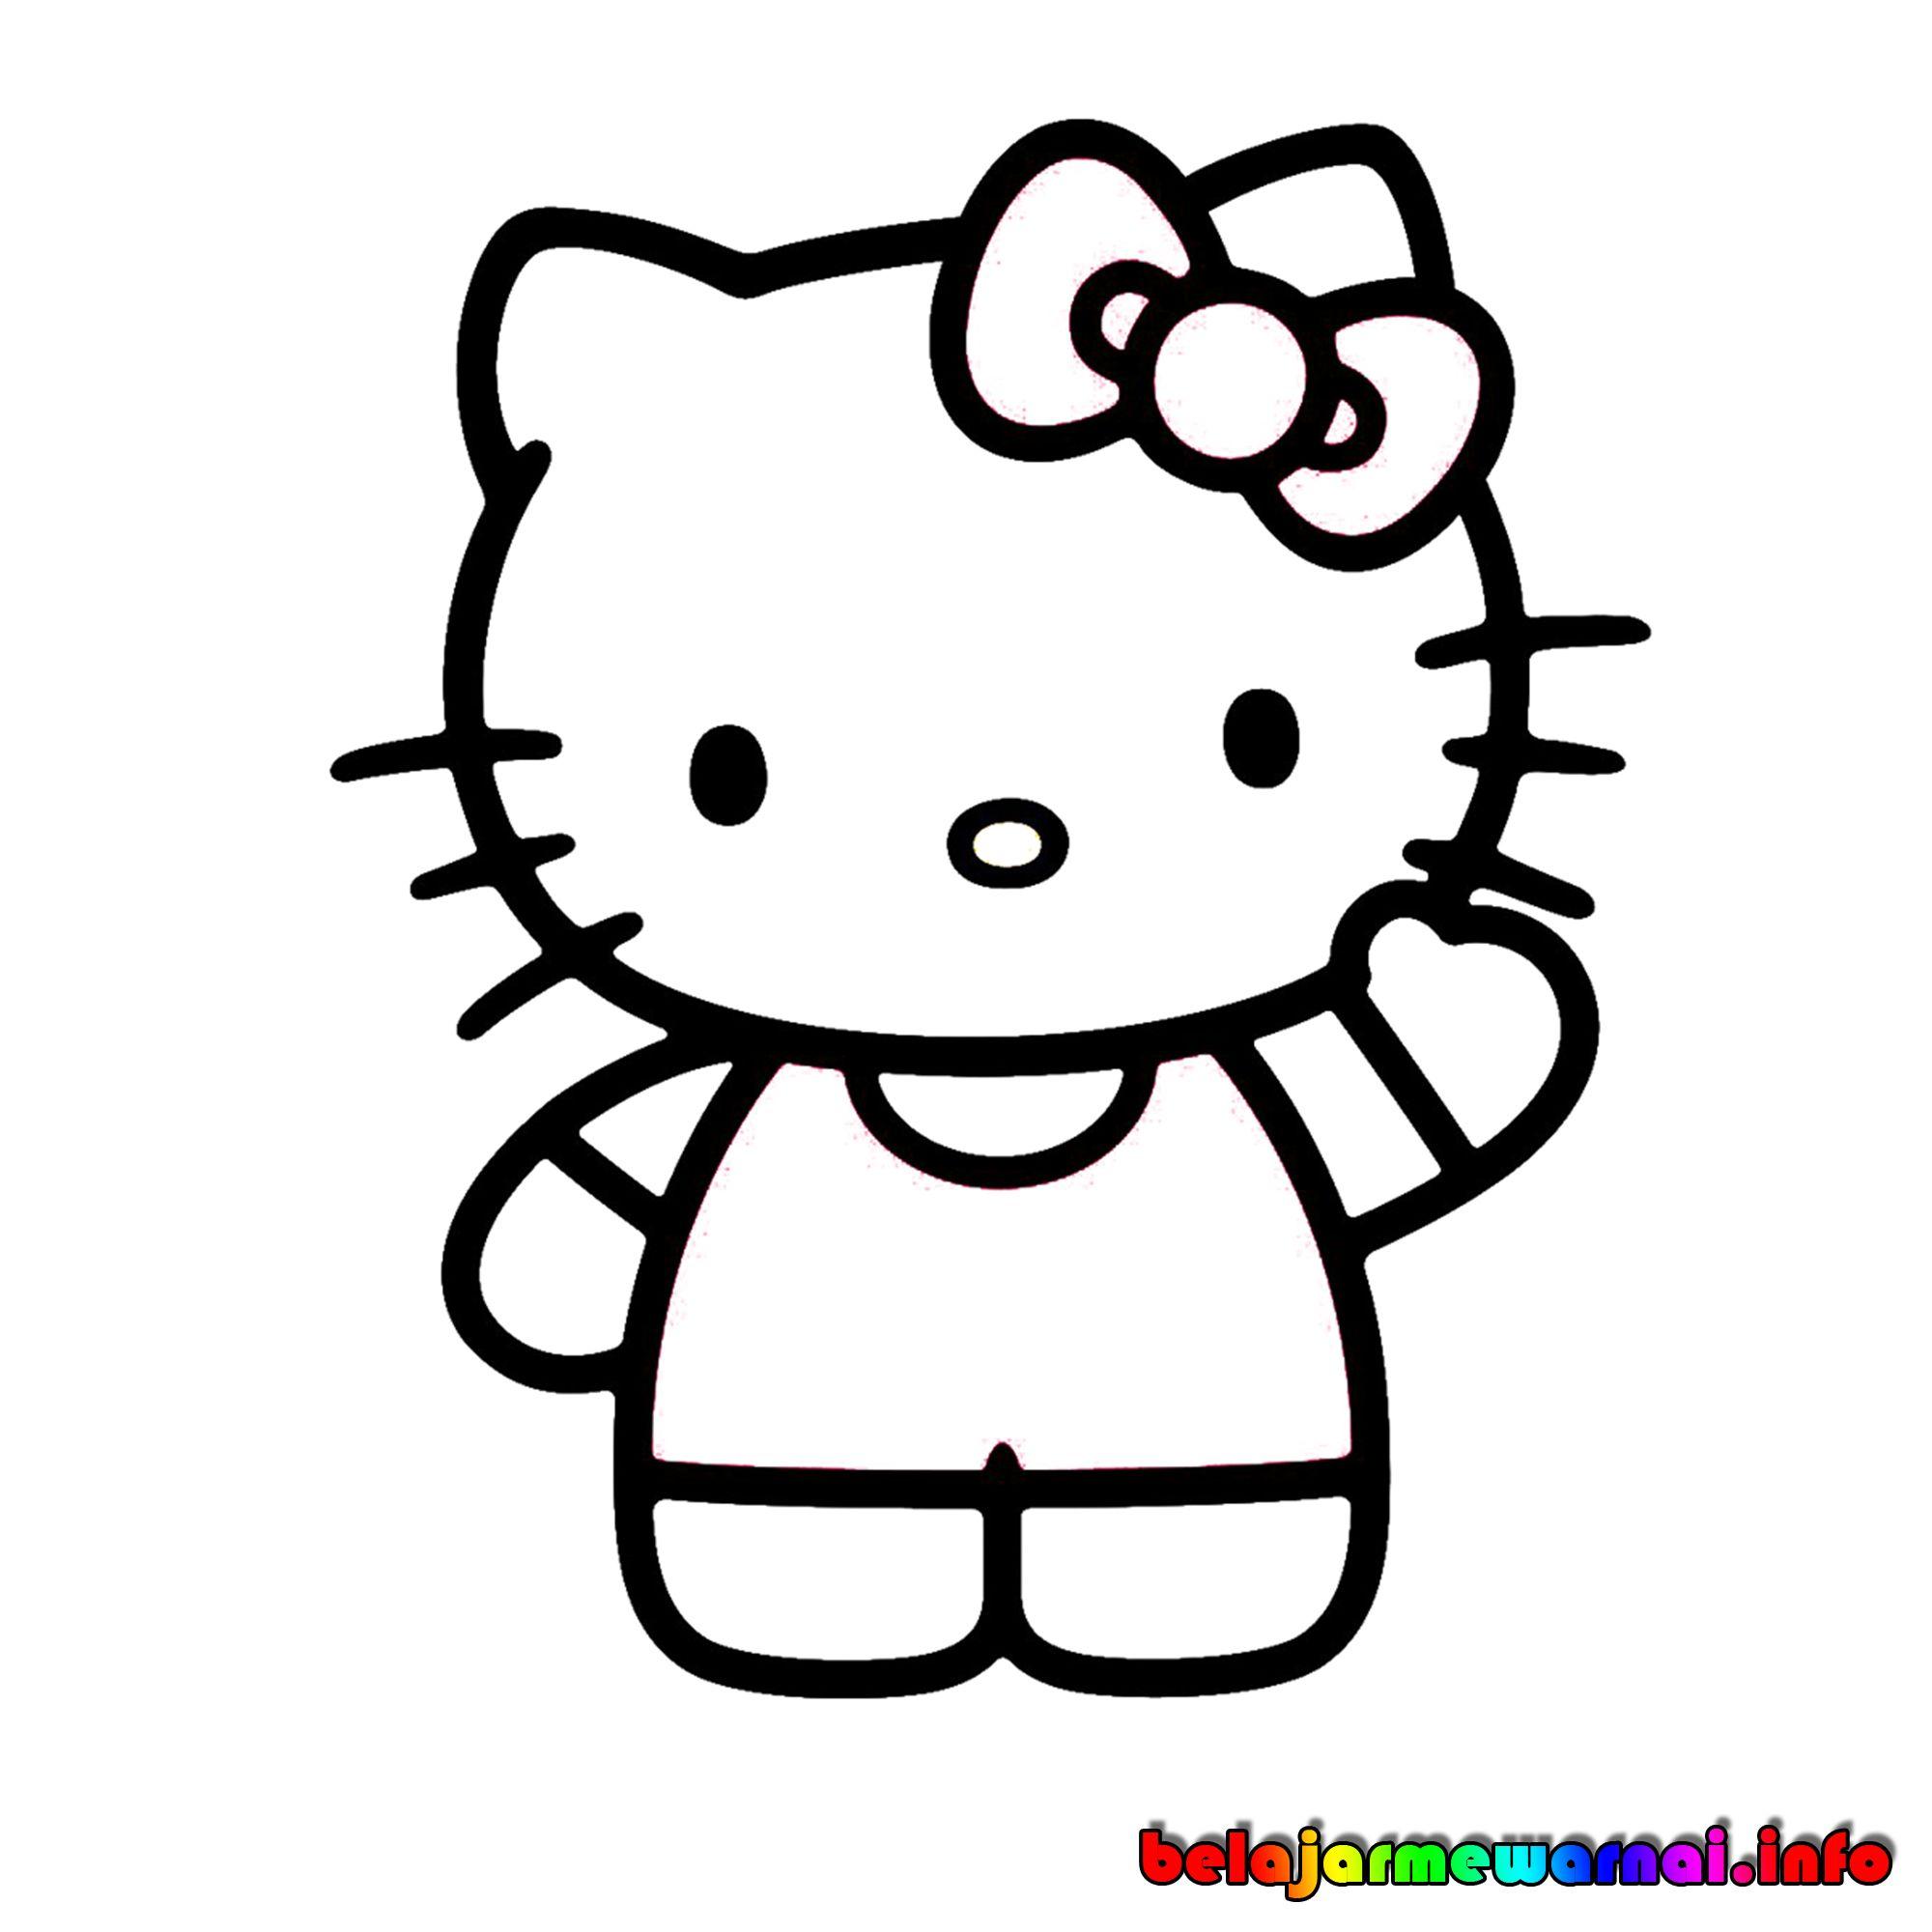 Download 94 Gambar Kartun Lucu Hitam Putih Terbaik Gratis Hello Kitty Kartun Animasi